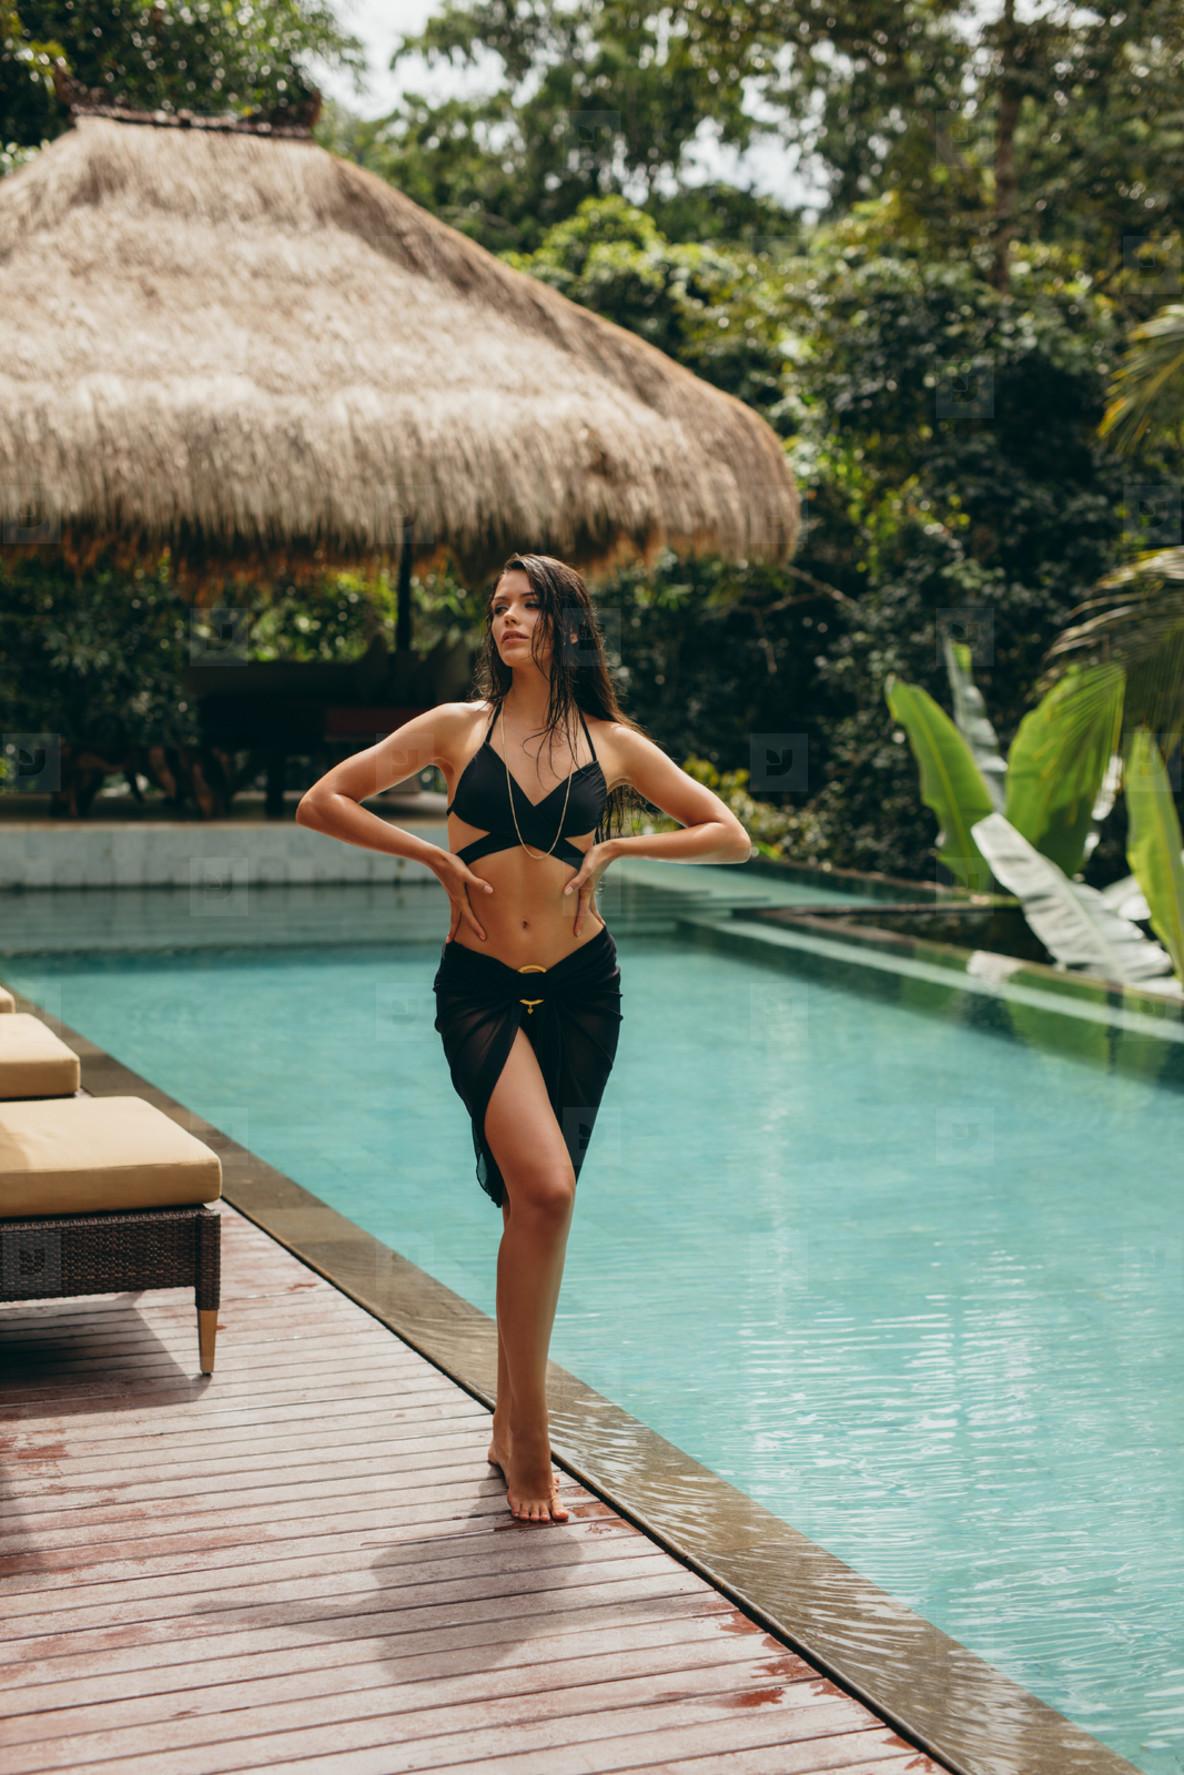 Attractive bikini model posing at poolside